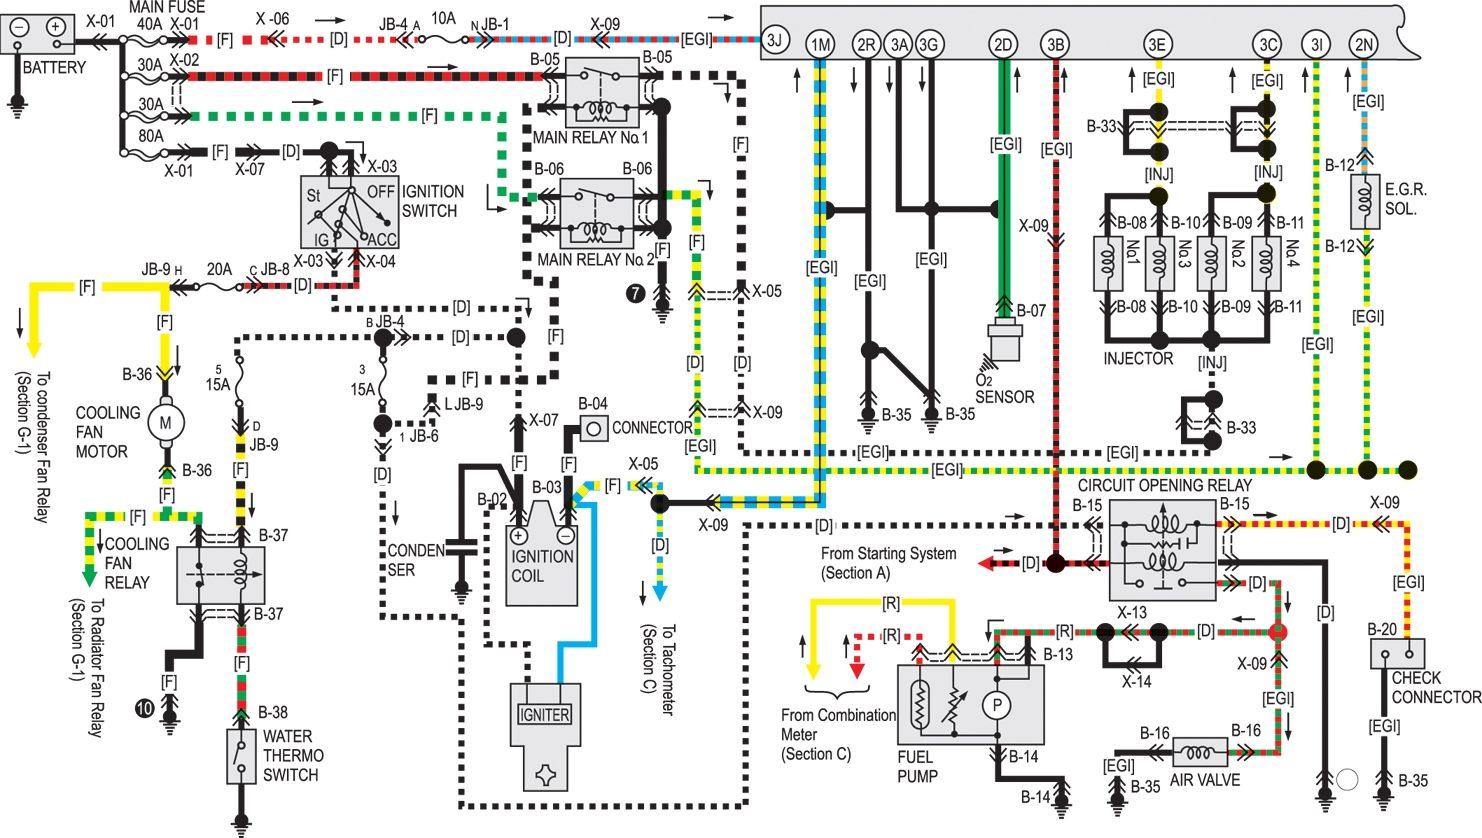 small resolution of 1992 mazda b2200 alternator wiring diagram 87 mazda b2200 ignition wiring diagram wiring diagrams